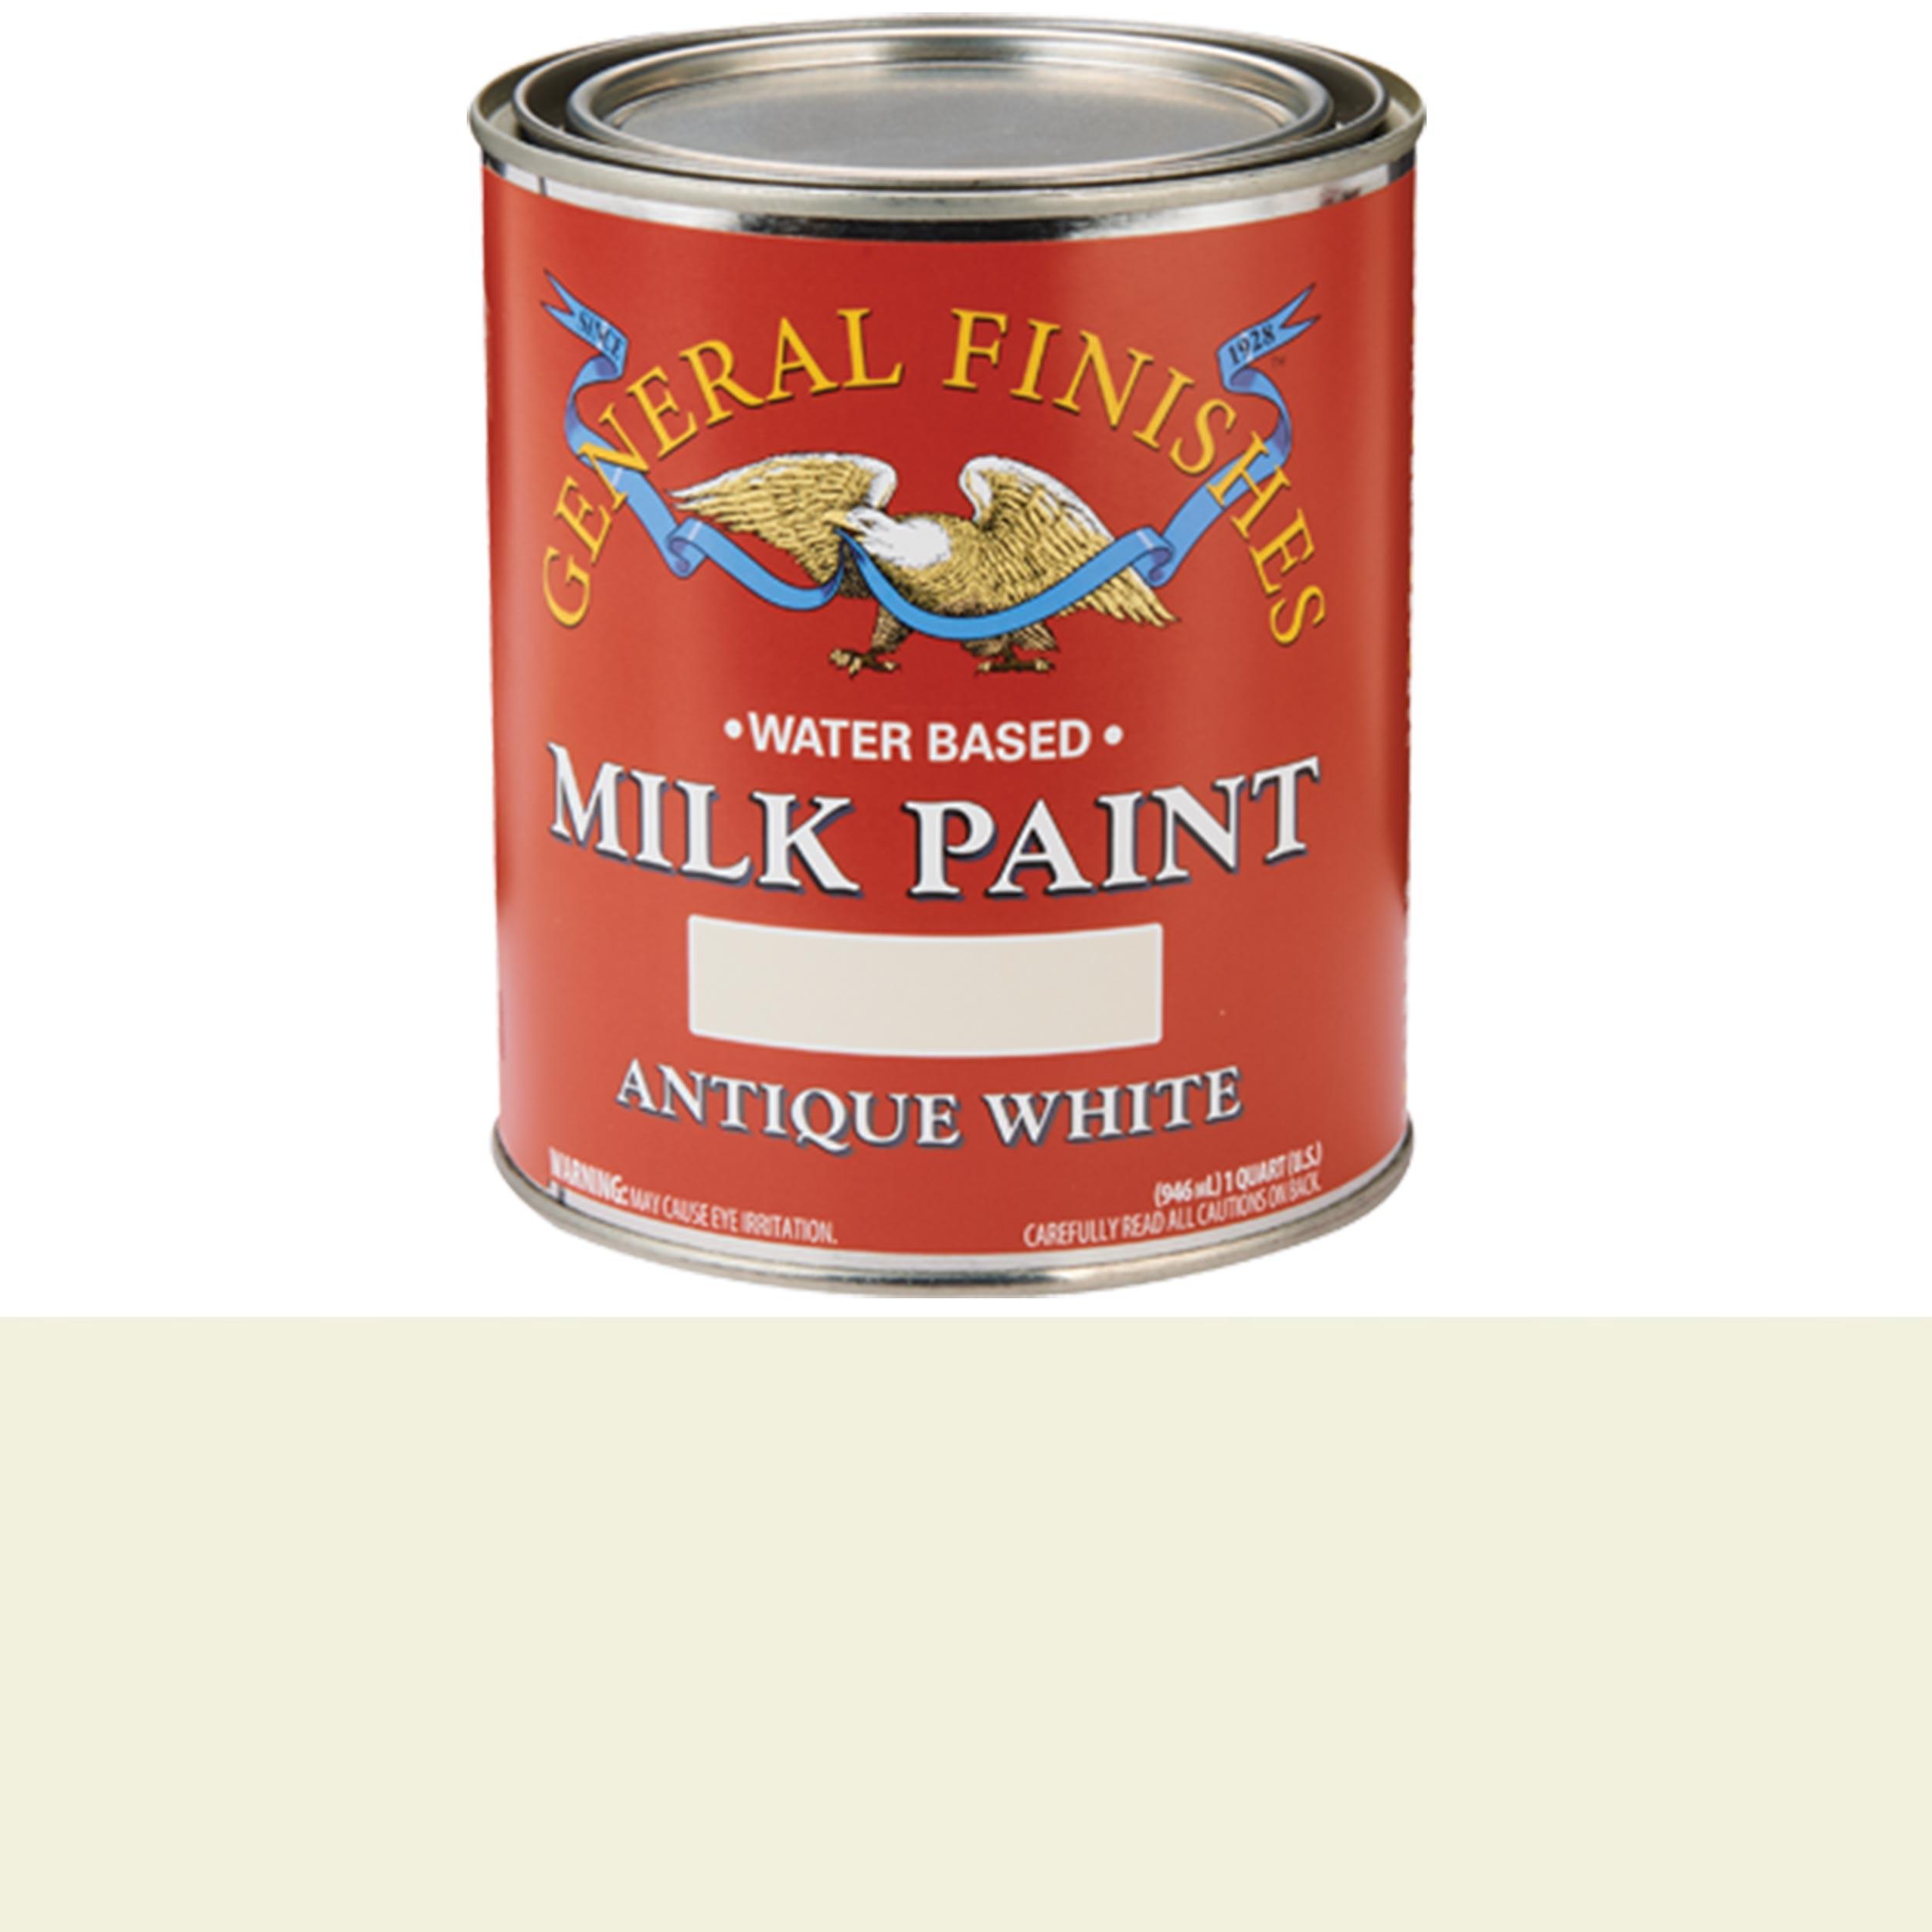 Antique White Milk Paint Water Based Quart